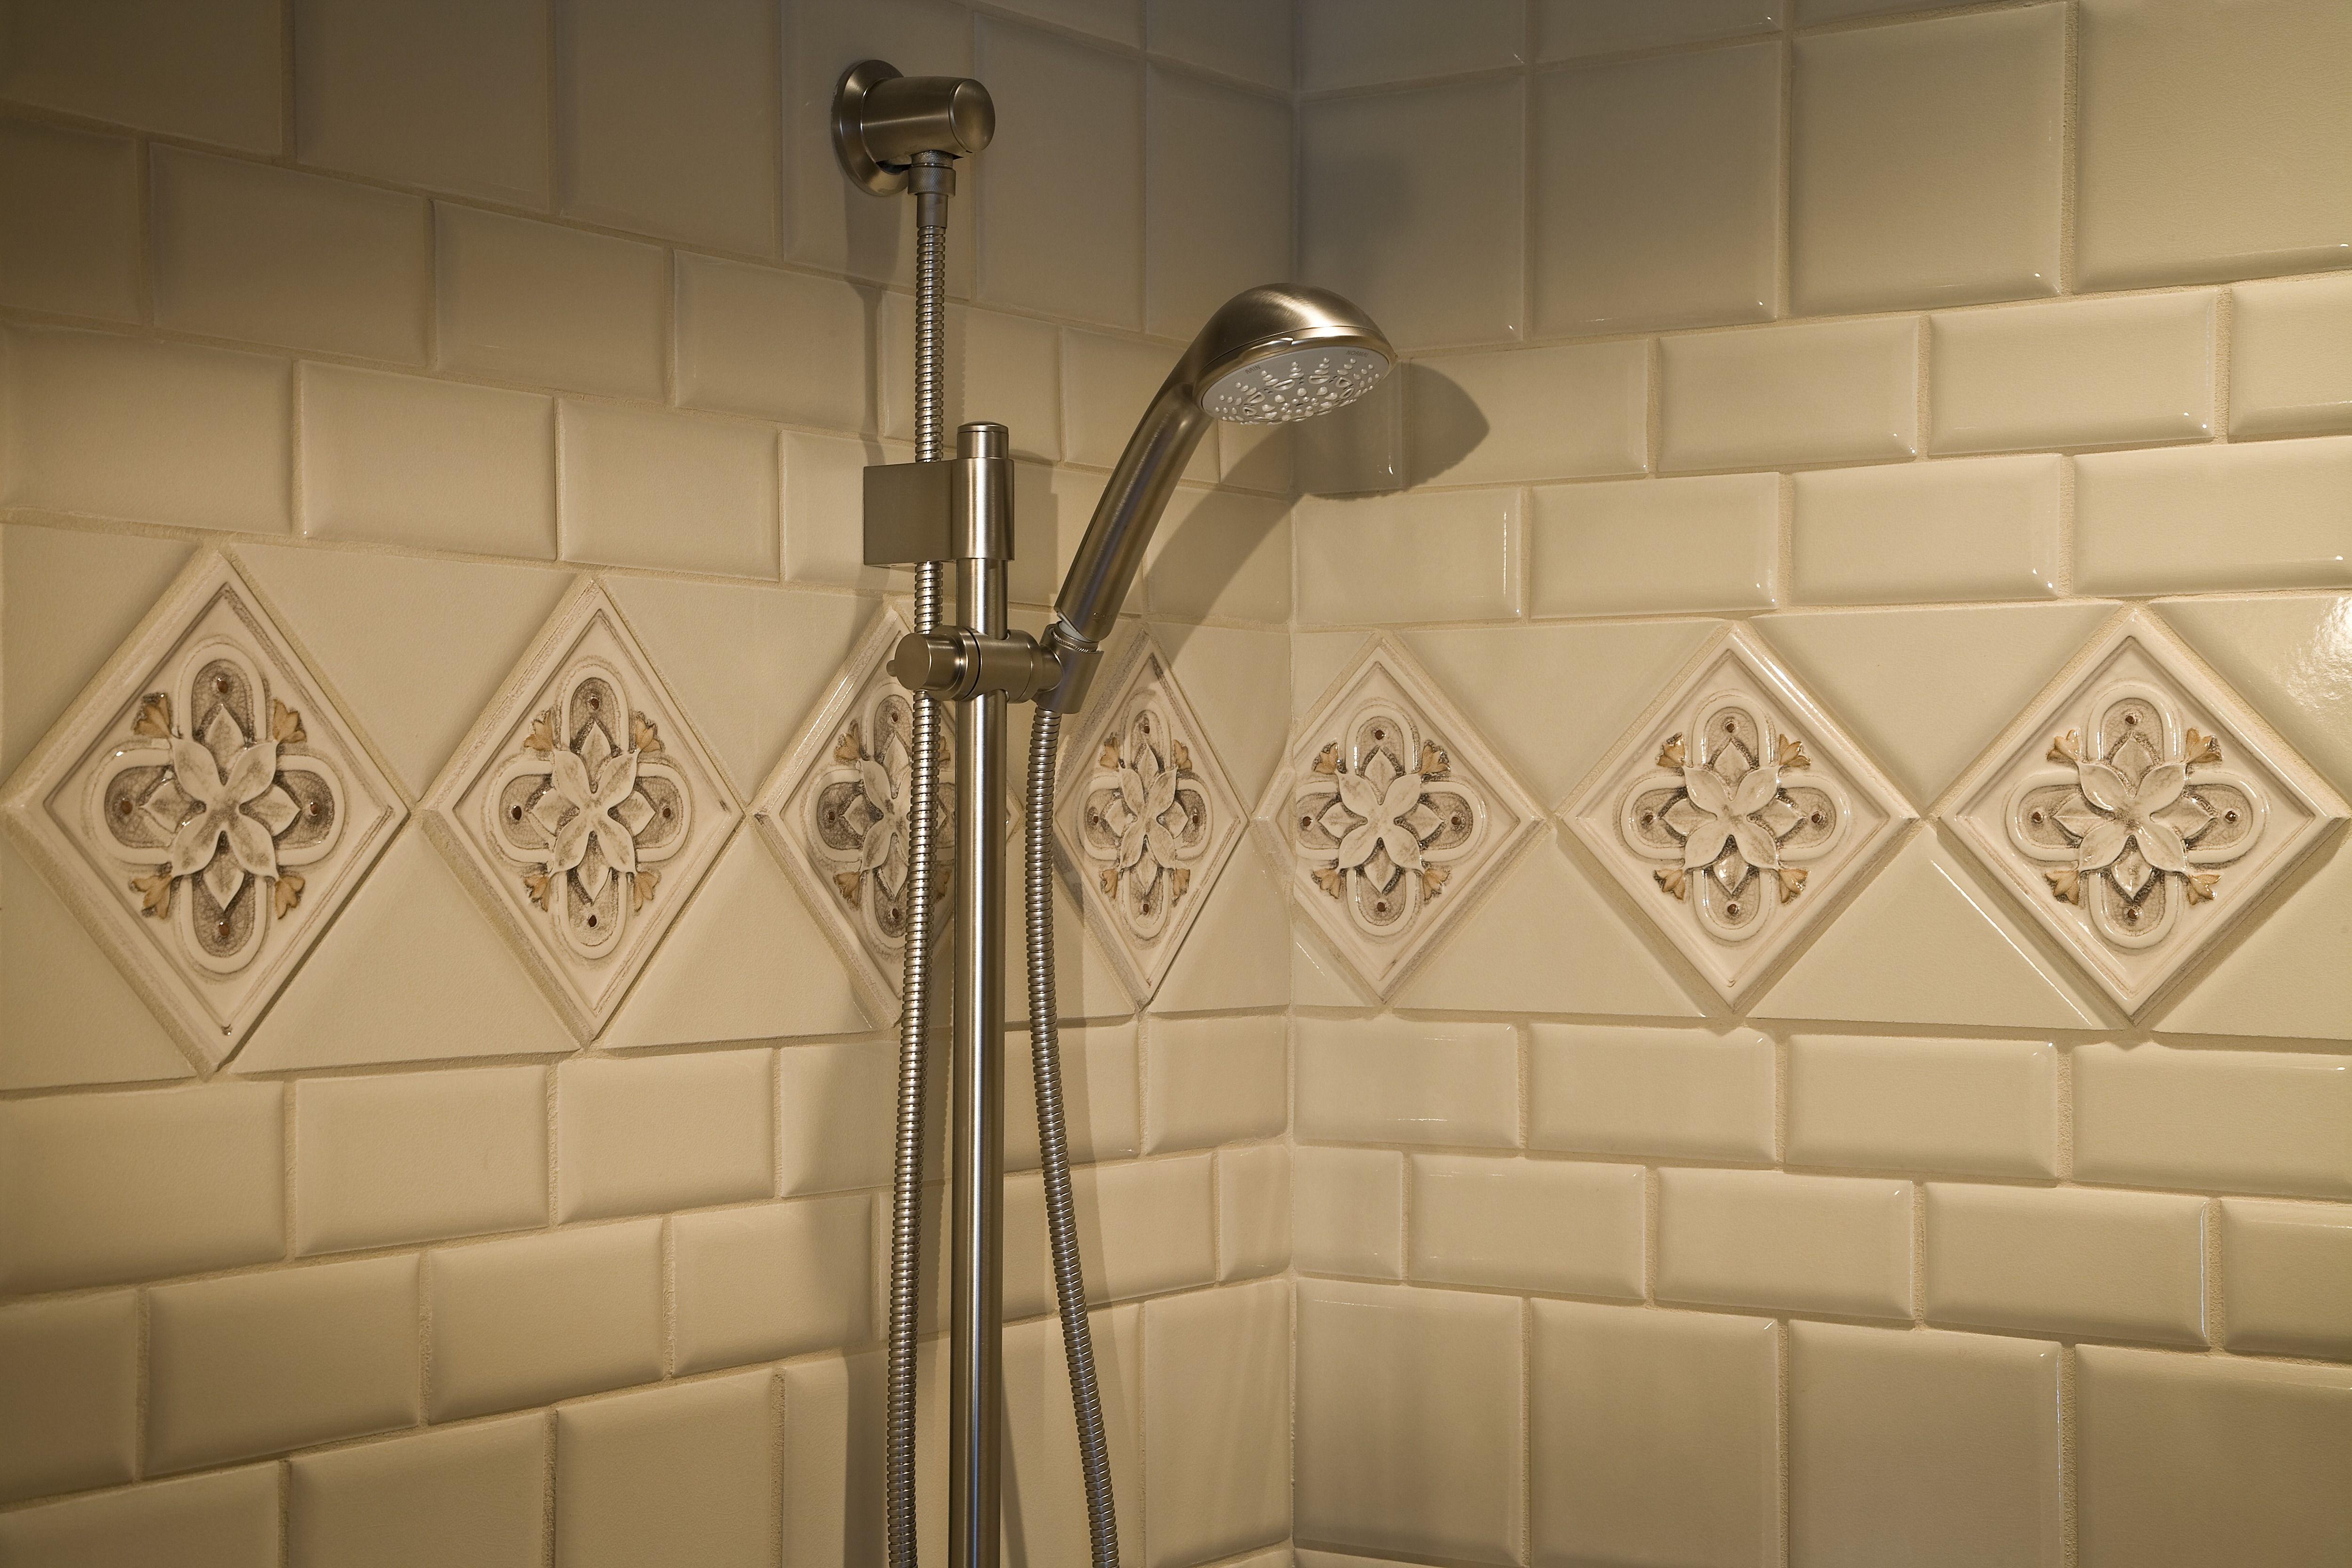 tile calculator estimator tile flooring ceiling square footage bathroom shower heads tile bathroom bathroom shower